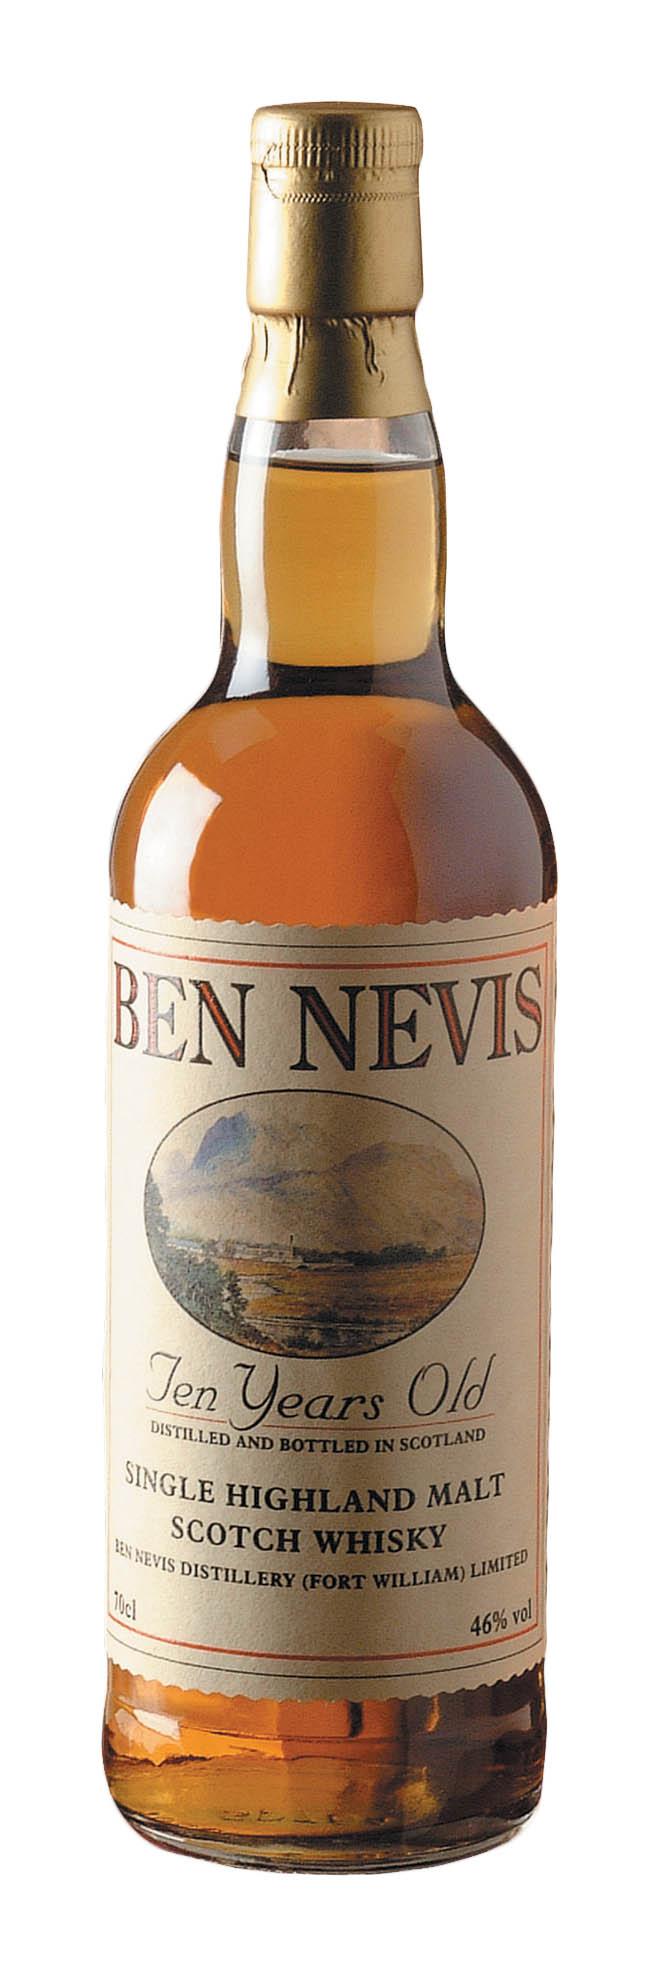 Ben Nevis 10 Years Old